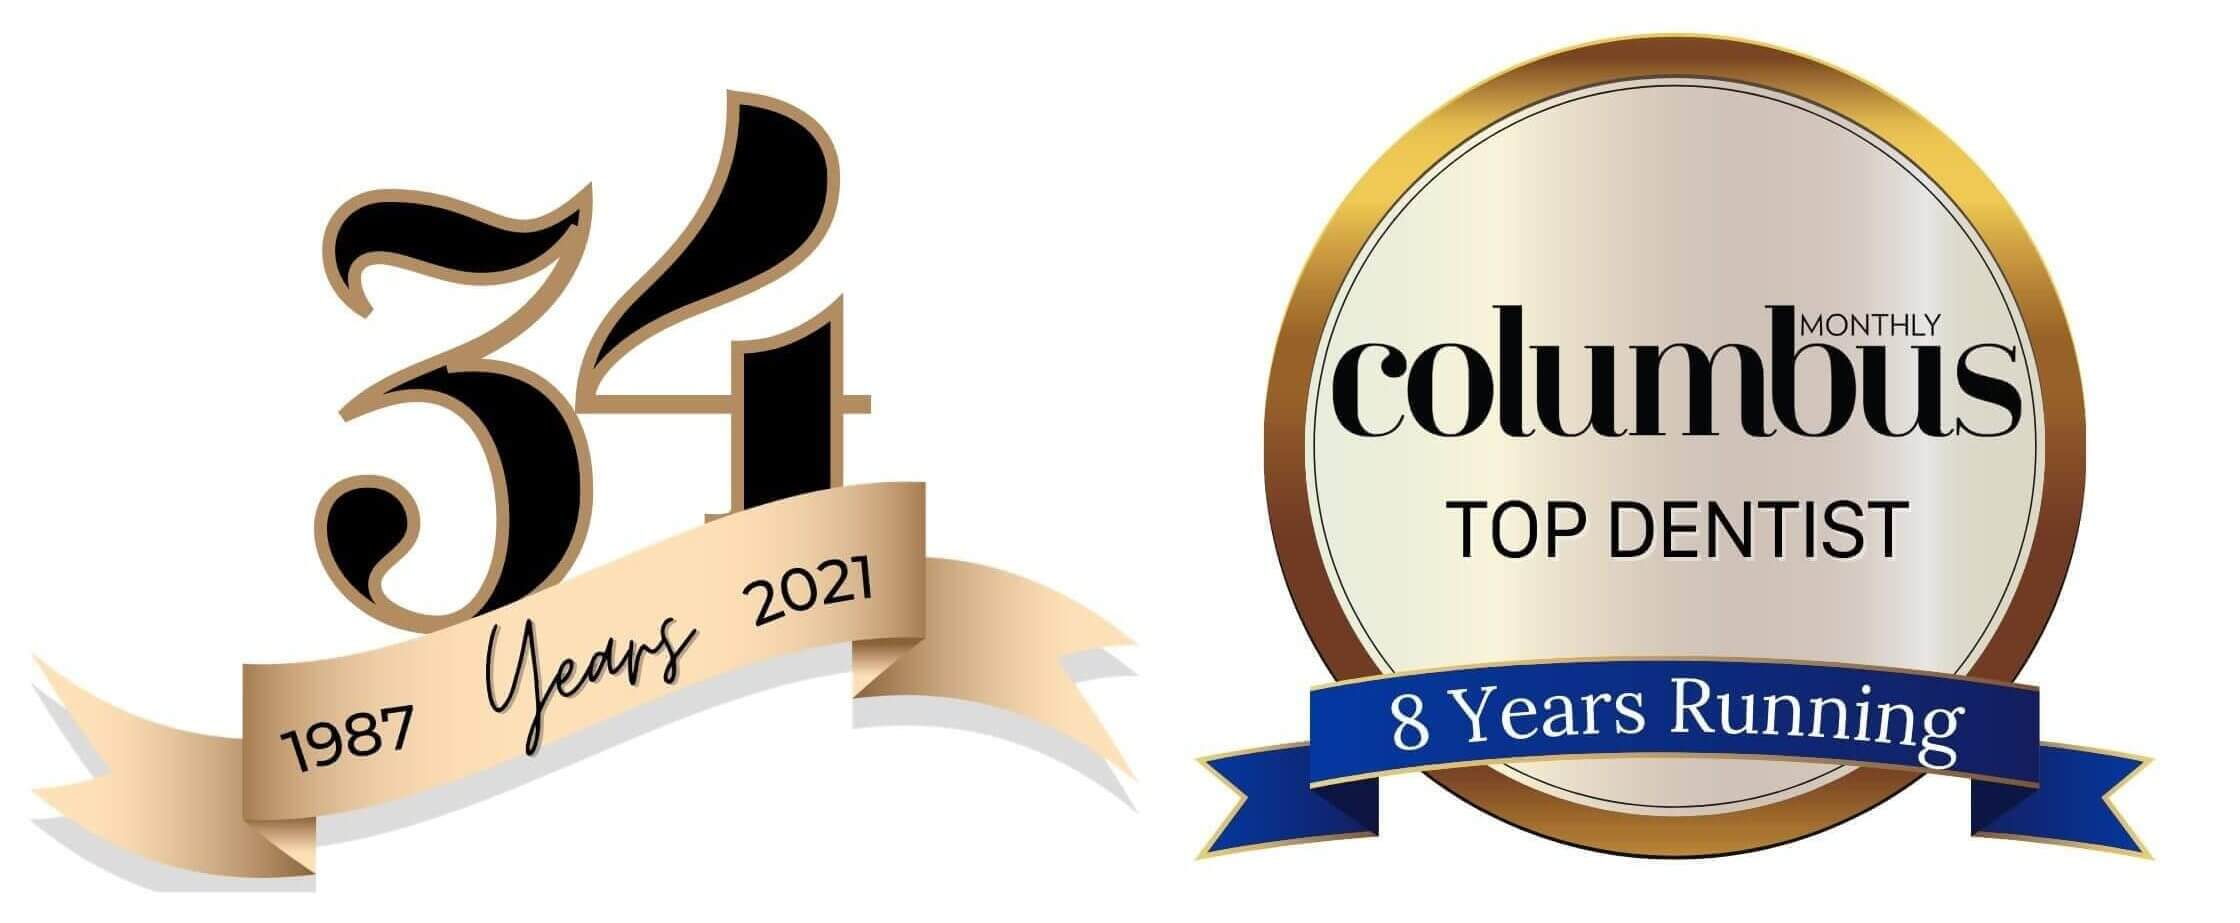 34 years of Columbus top dentist